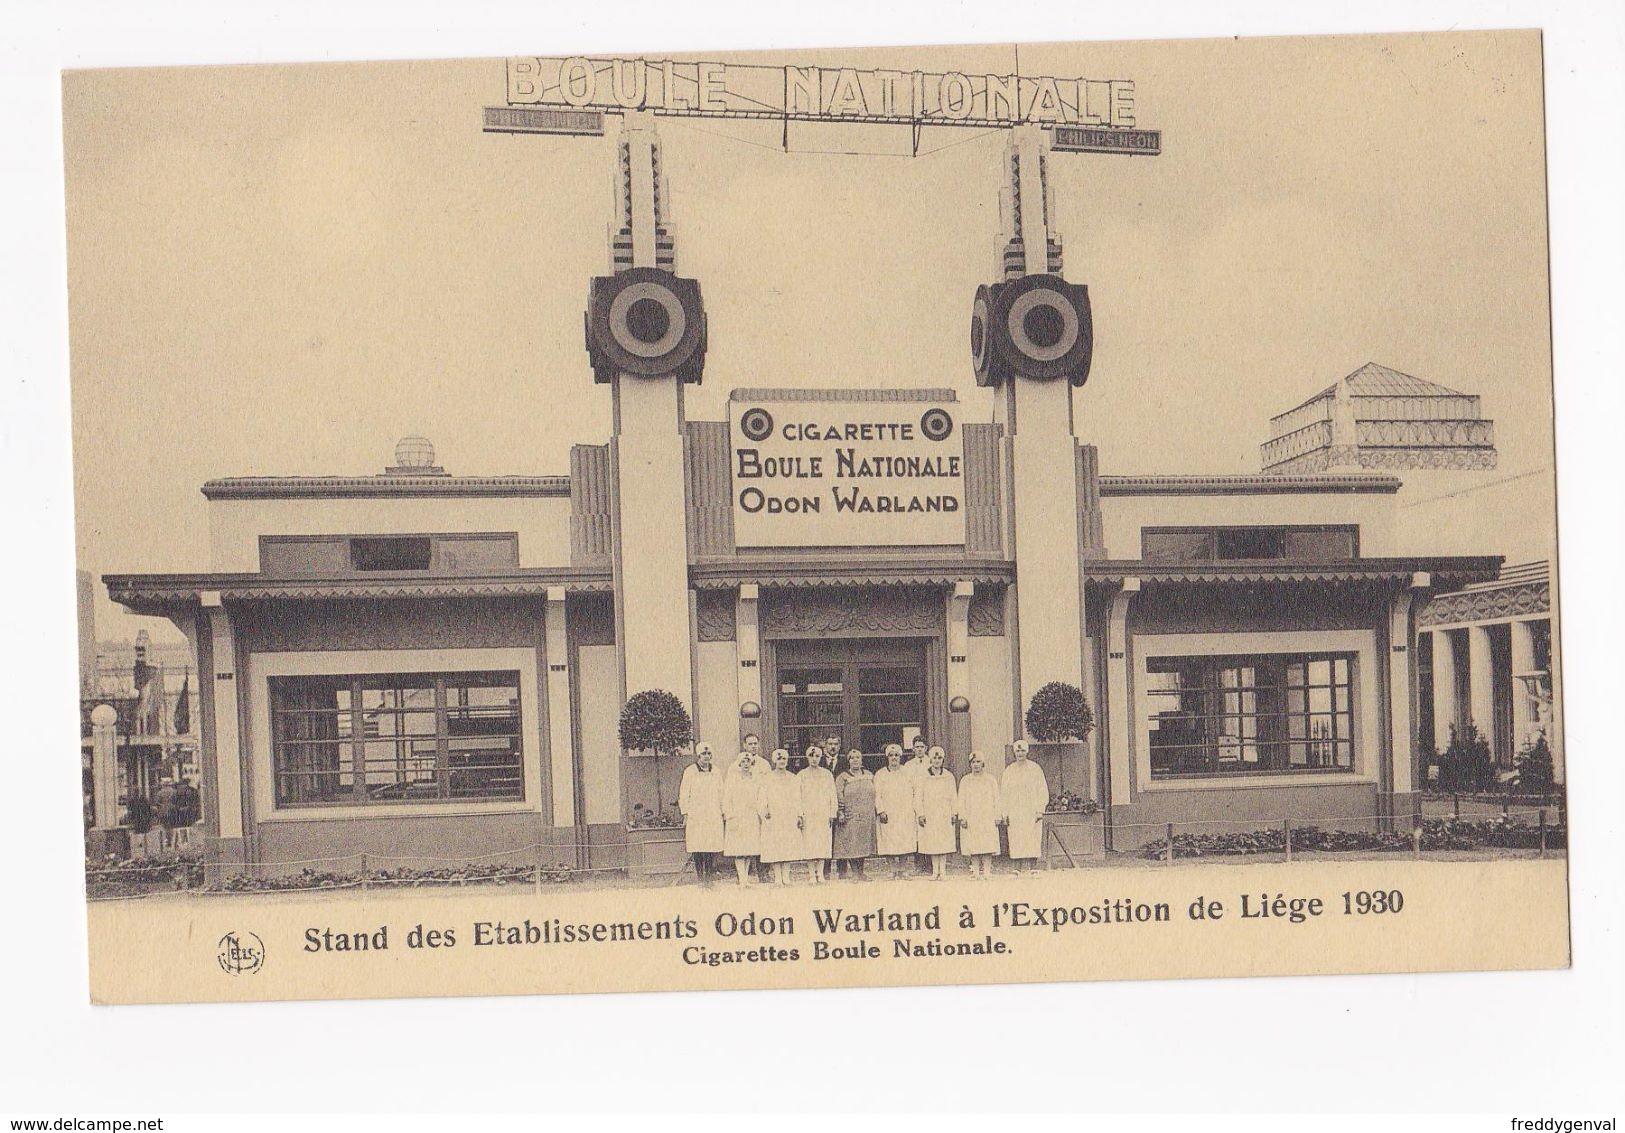 LIEGE EXPO 1930 ODON WARLAND - Liege